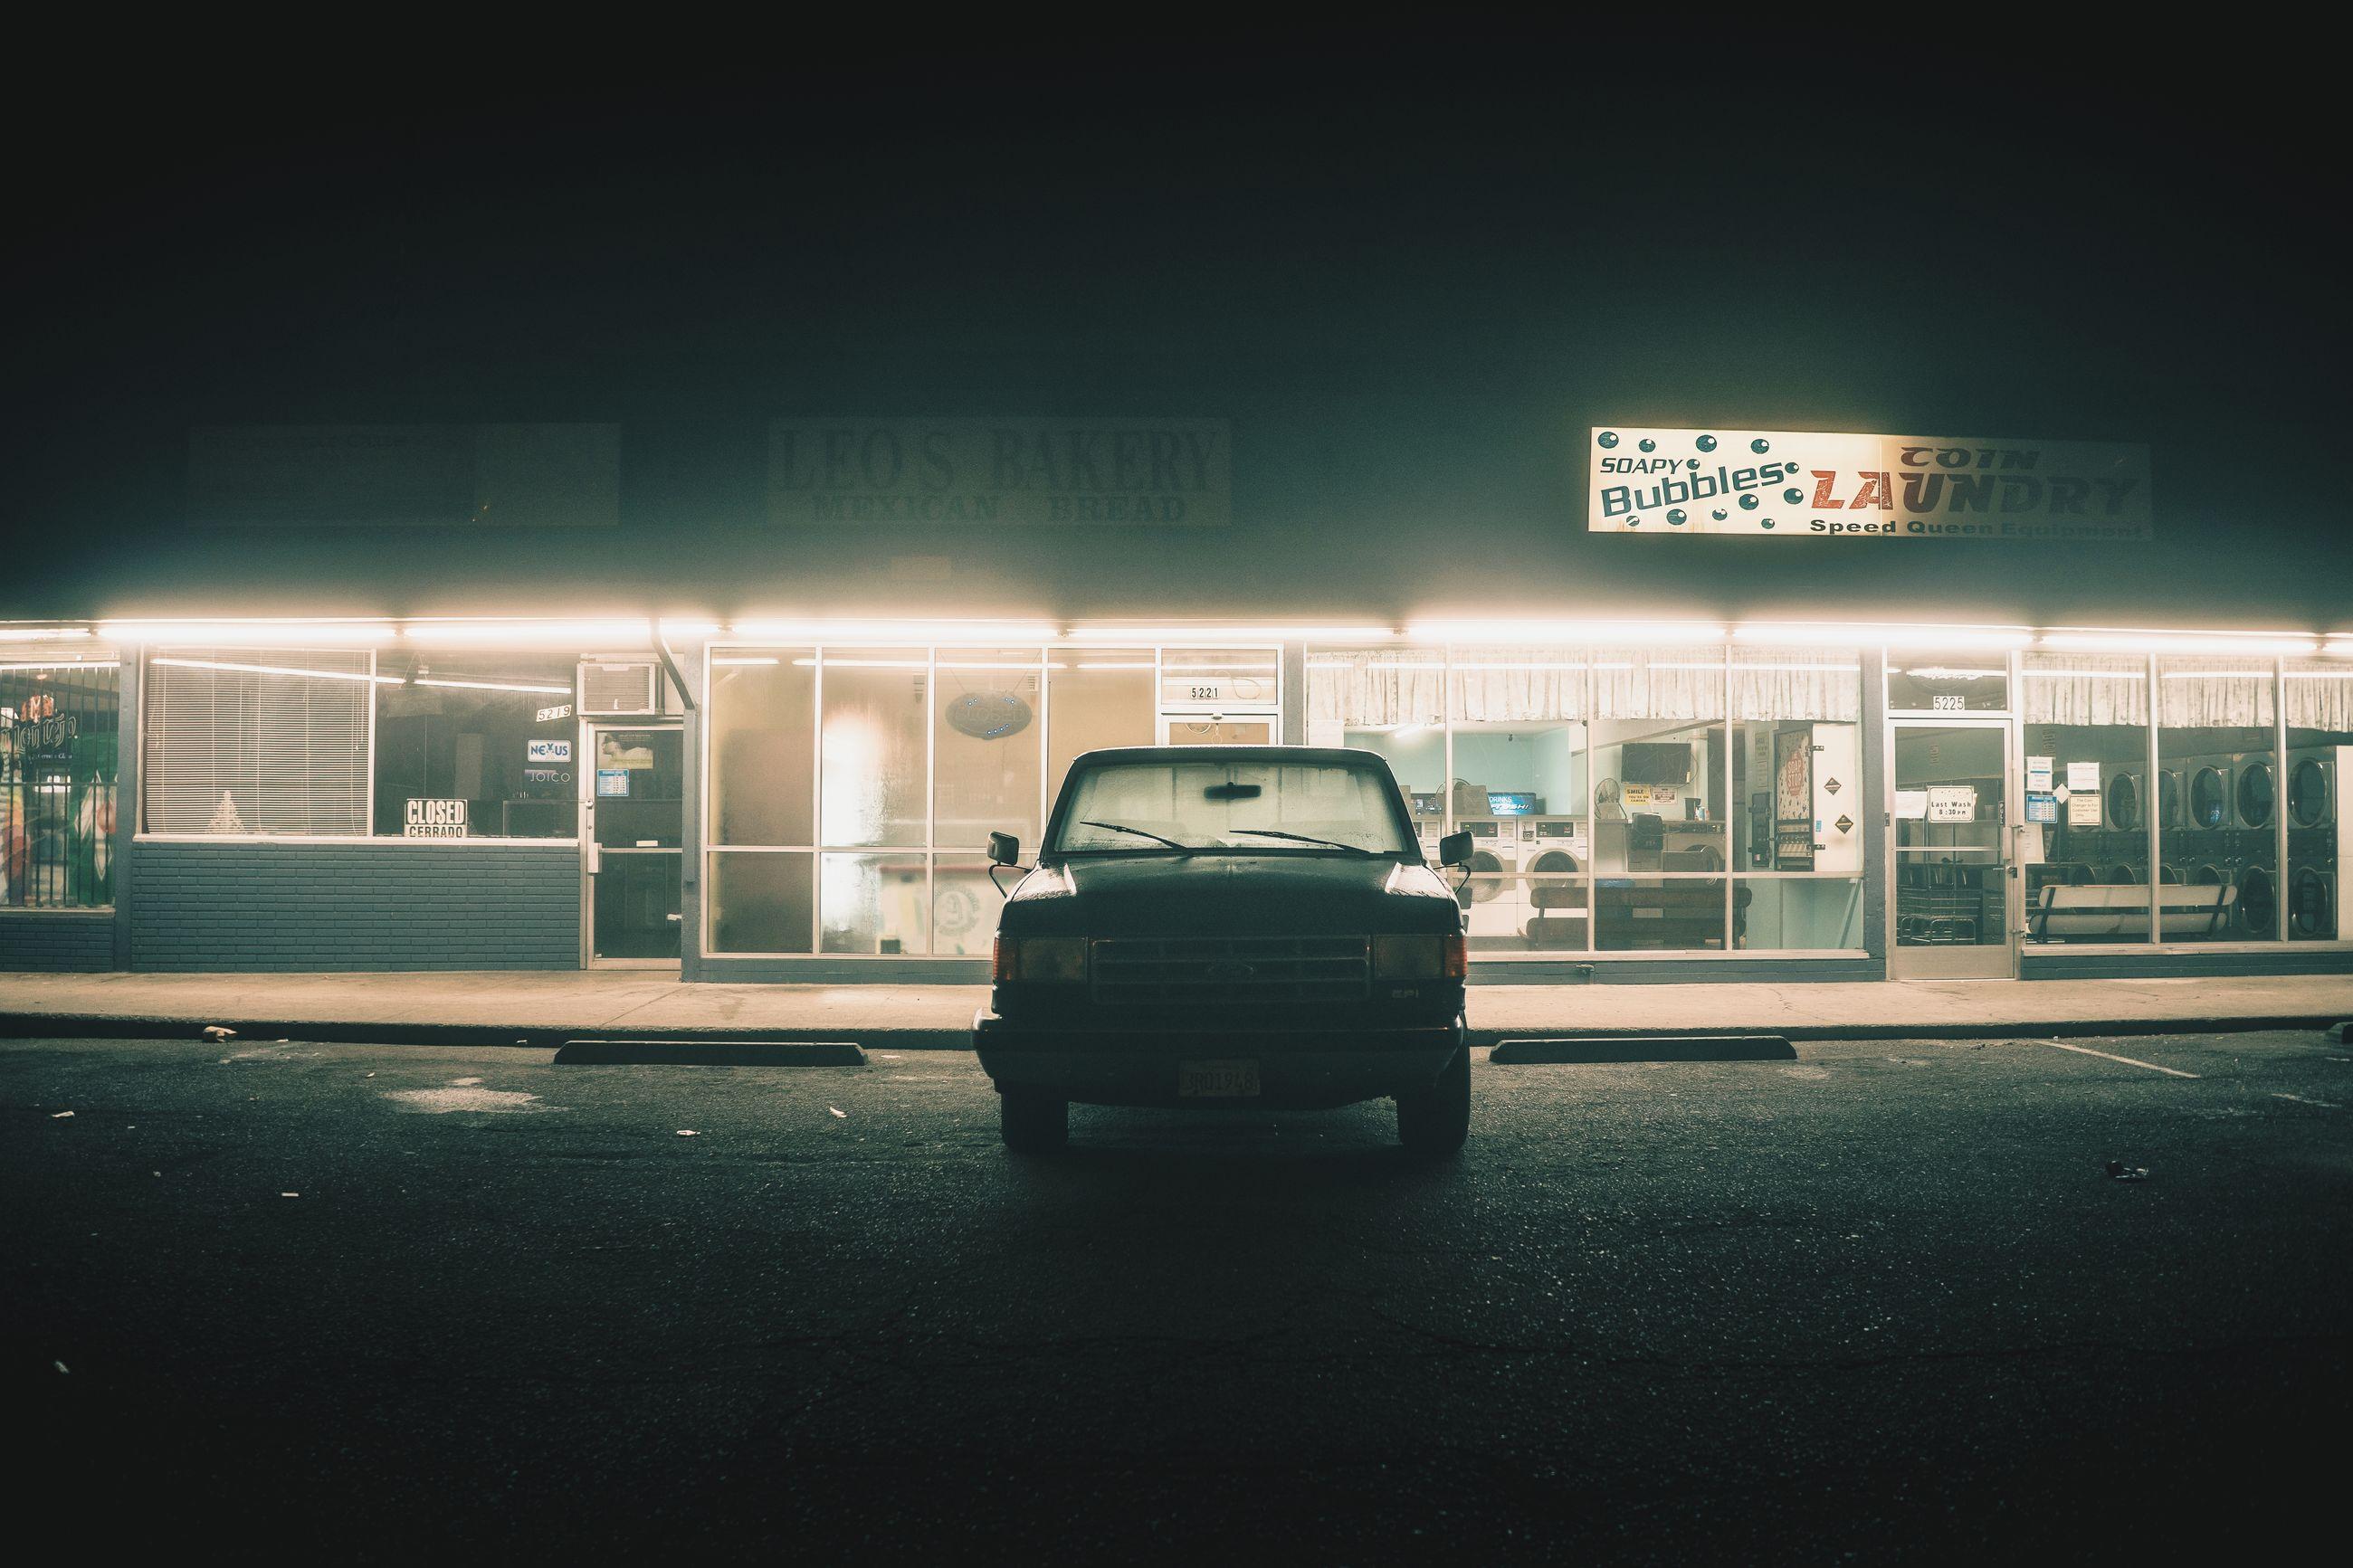 transportation, illuminated, public transportation, text, indoors, no people, night